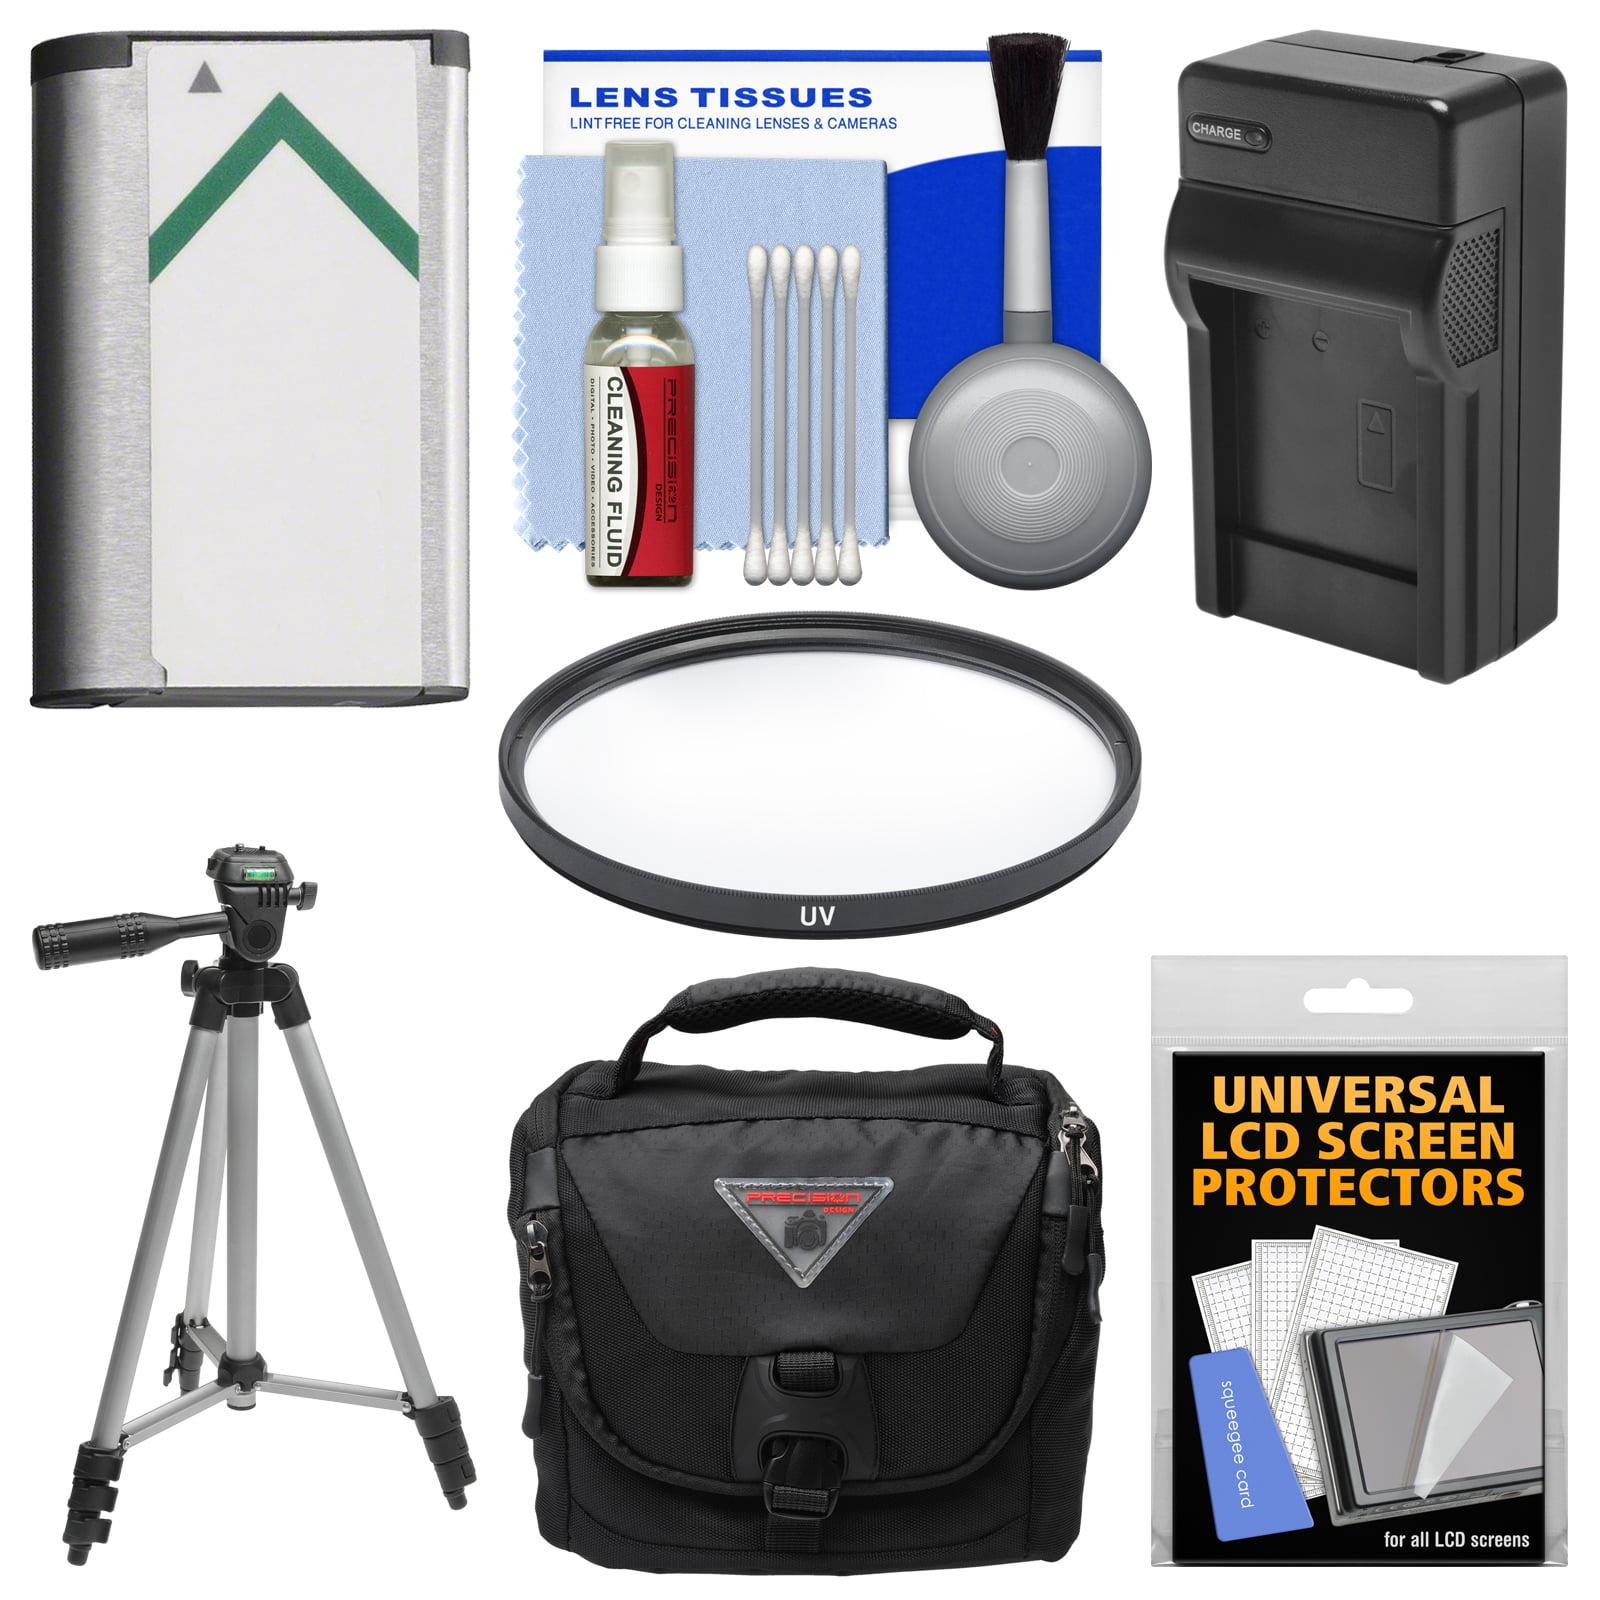 Essentials Bundle for Sony Cyber-Shot DSC-H400, DSC-HX350, & DSC-HX400V Digital Camera with Case + NP-BX1 Battery & Charger + Tripod + UV Filter + Kit